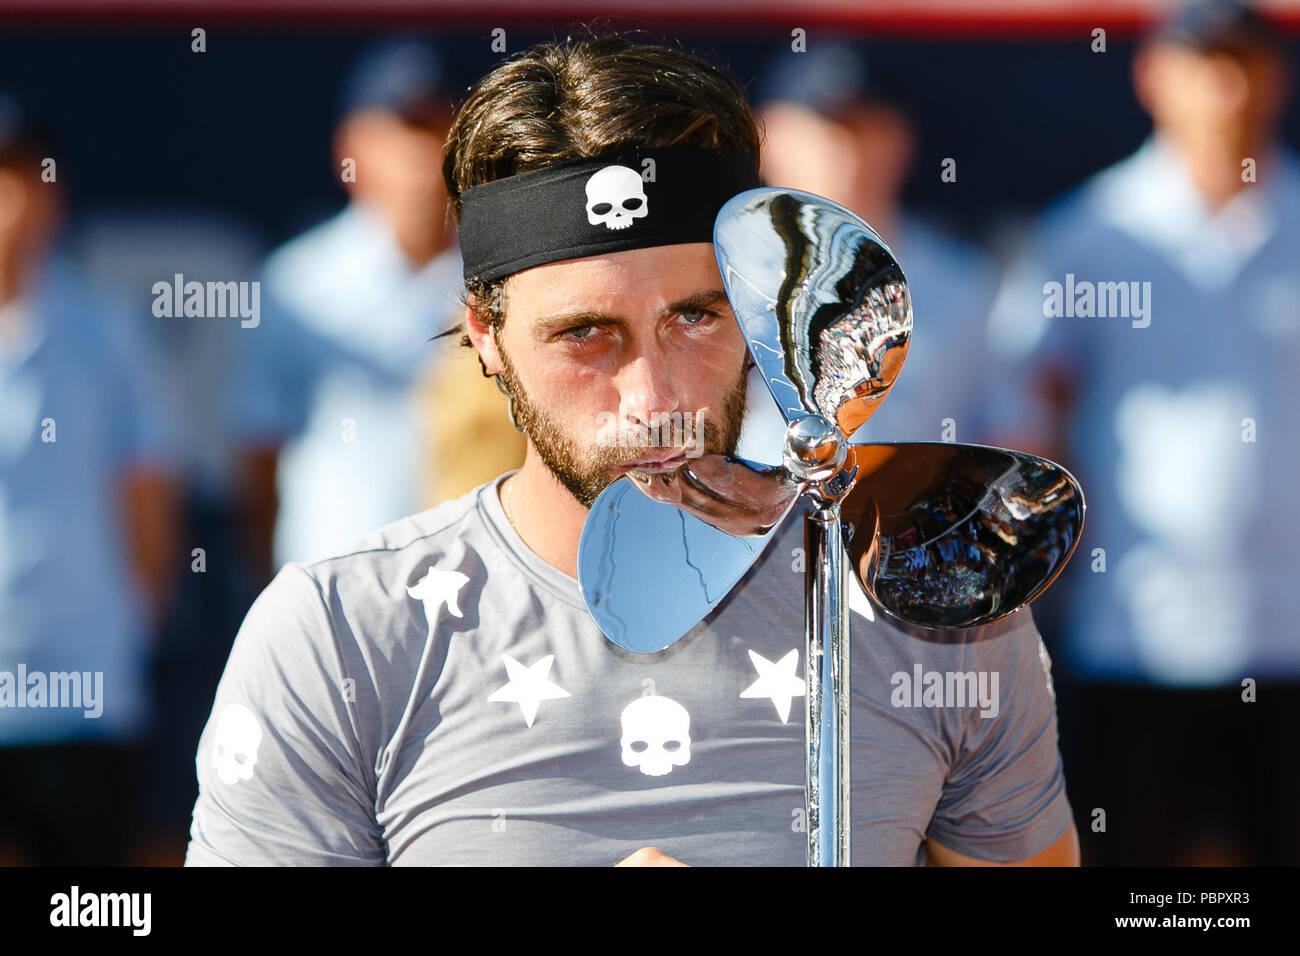 Hamburg, Germany, 29th July 2018: Nikoloz Basilashvili of Georgia won his 1st ATP Tour title when he defeated Leonardo Mayer in the final during the German Open at Hamburg Rothenbaum. Credit: Frank Molter/Alamy Live news - Stock Image